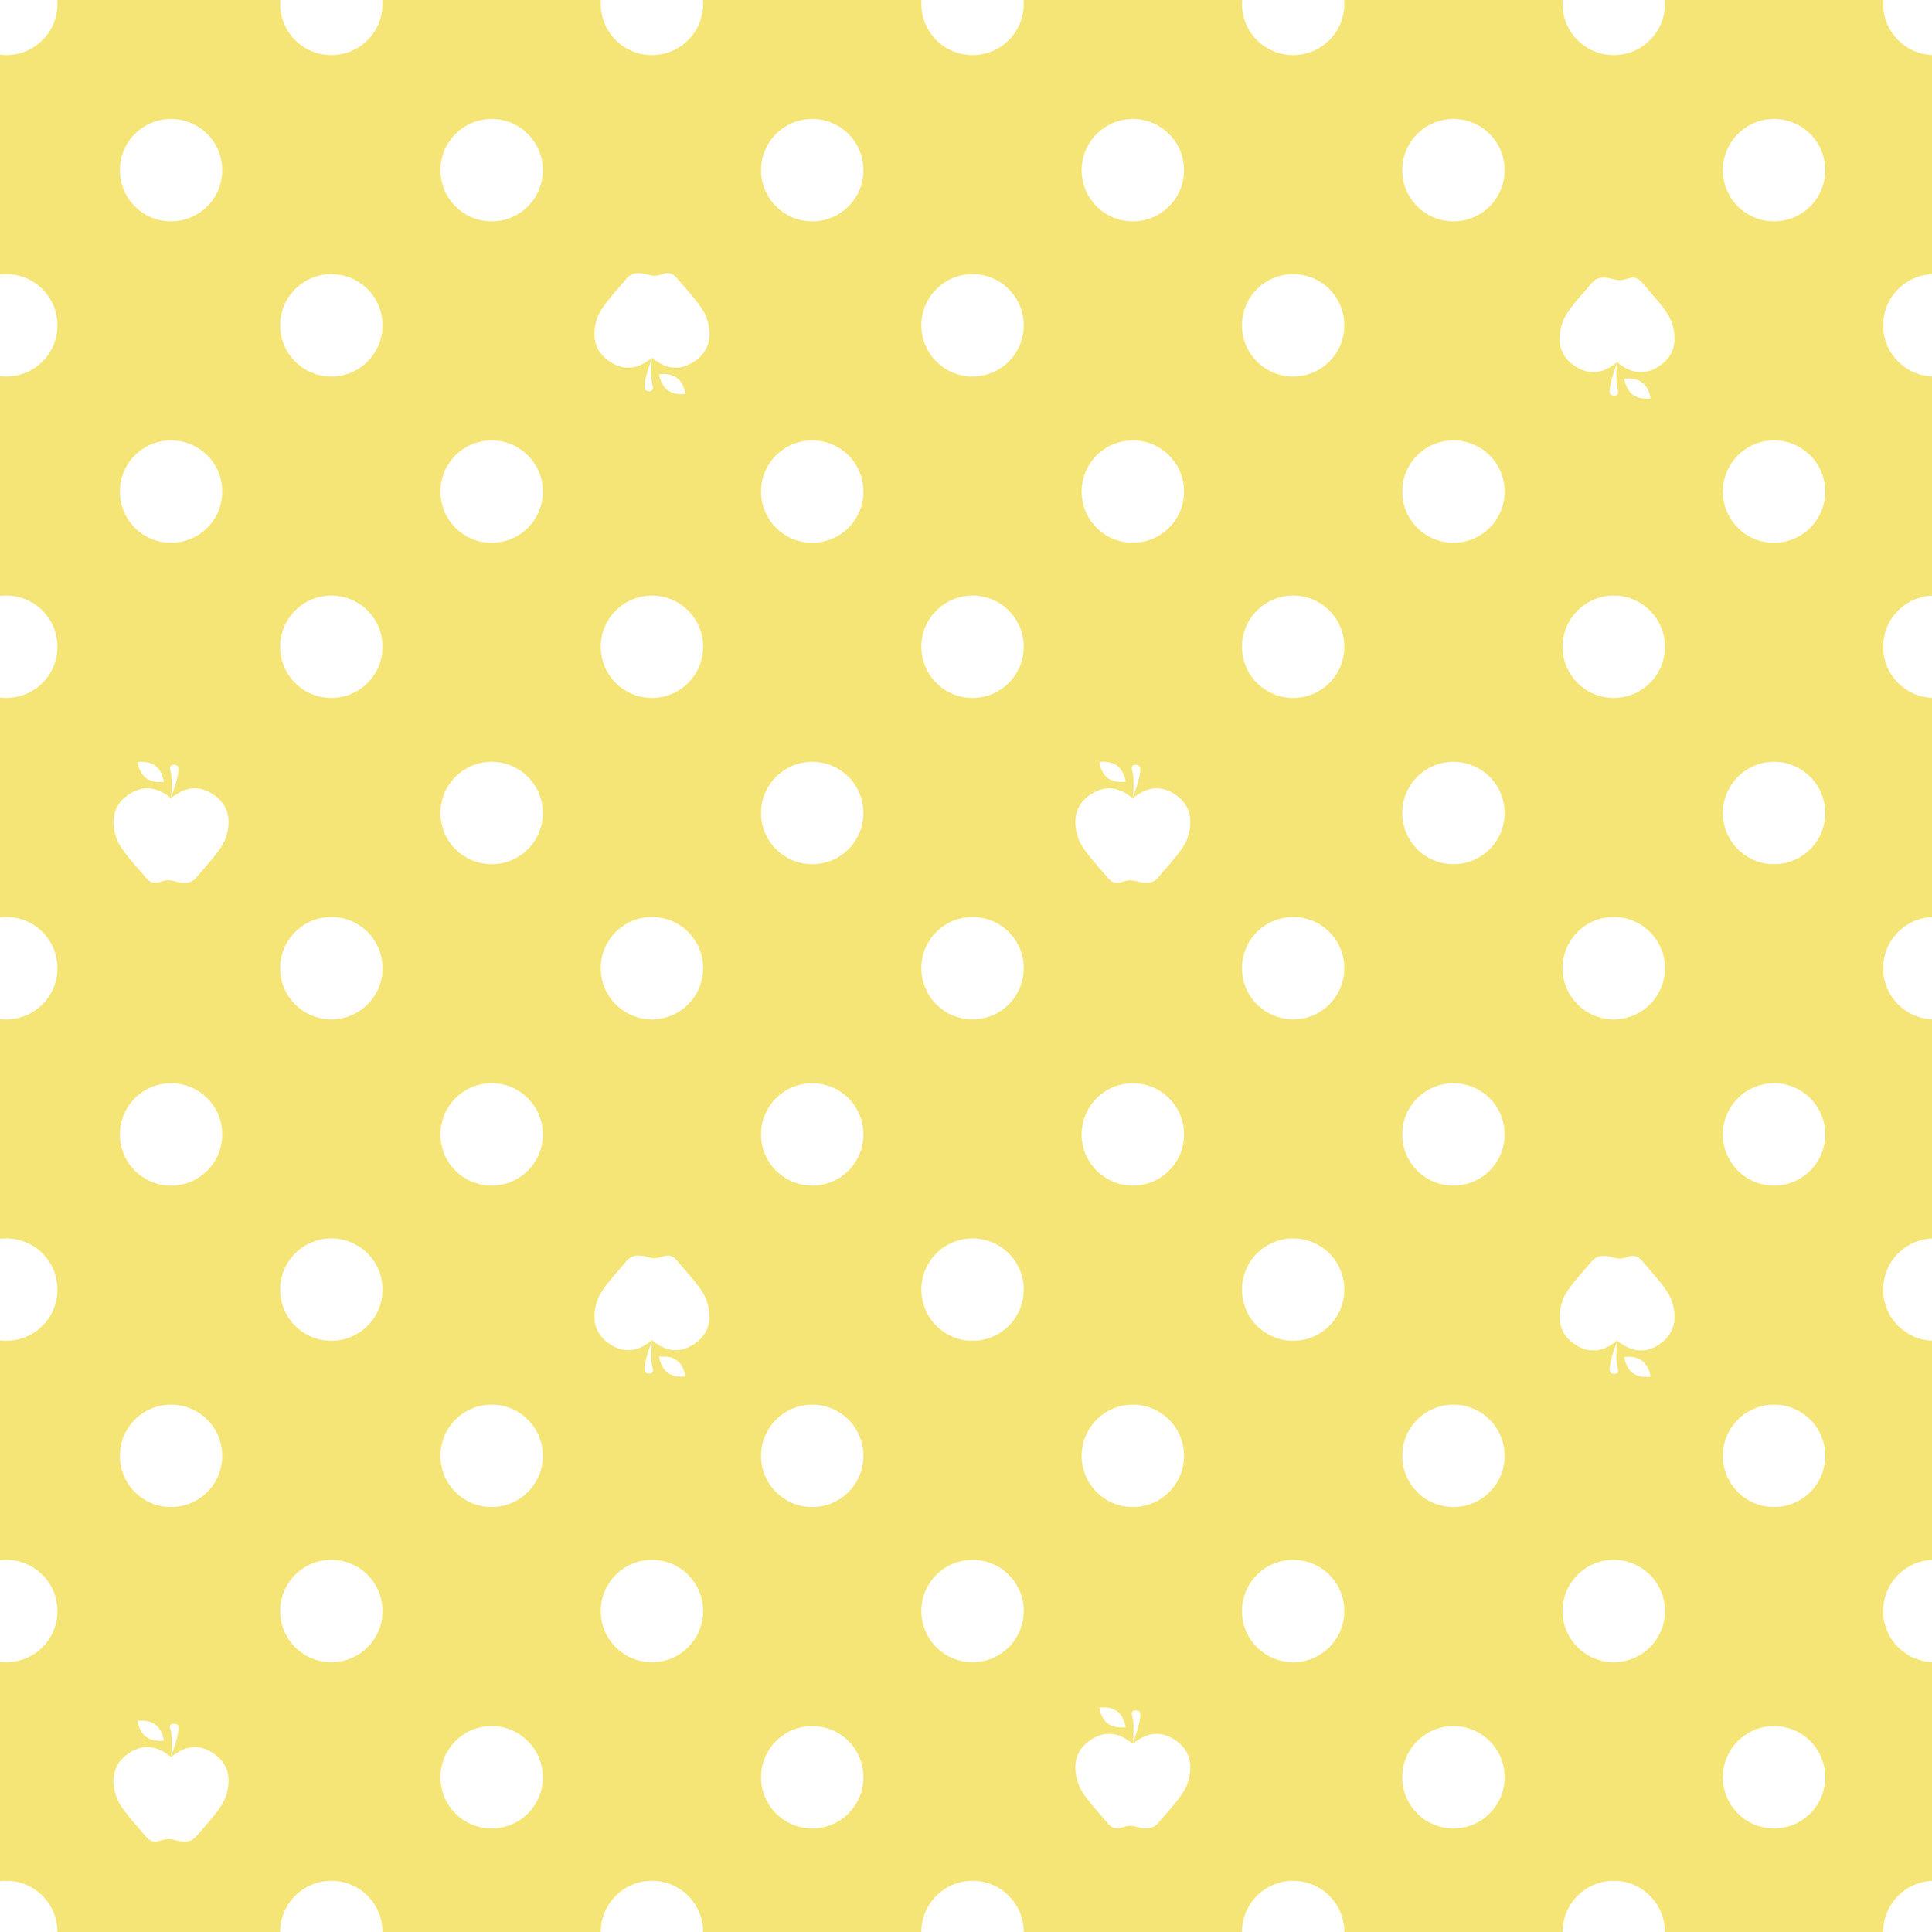 apple dots yellow-01.jpg